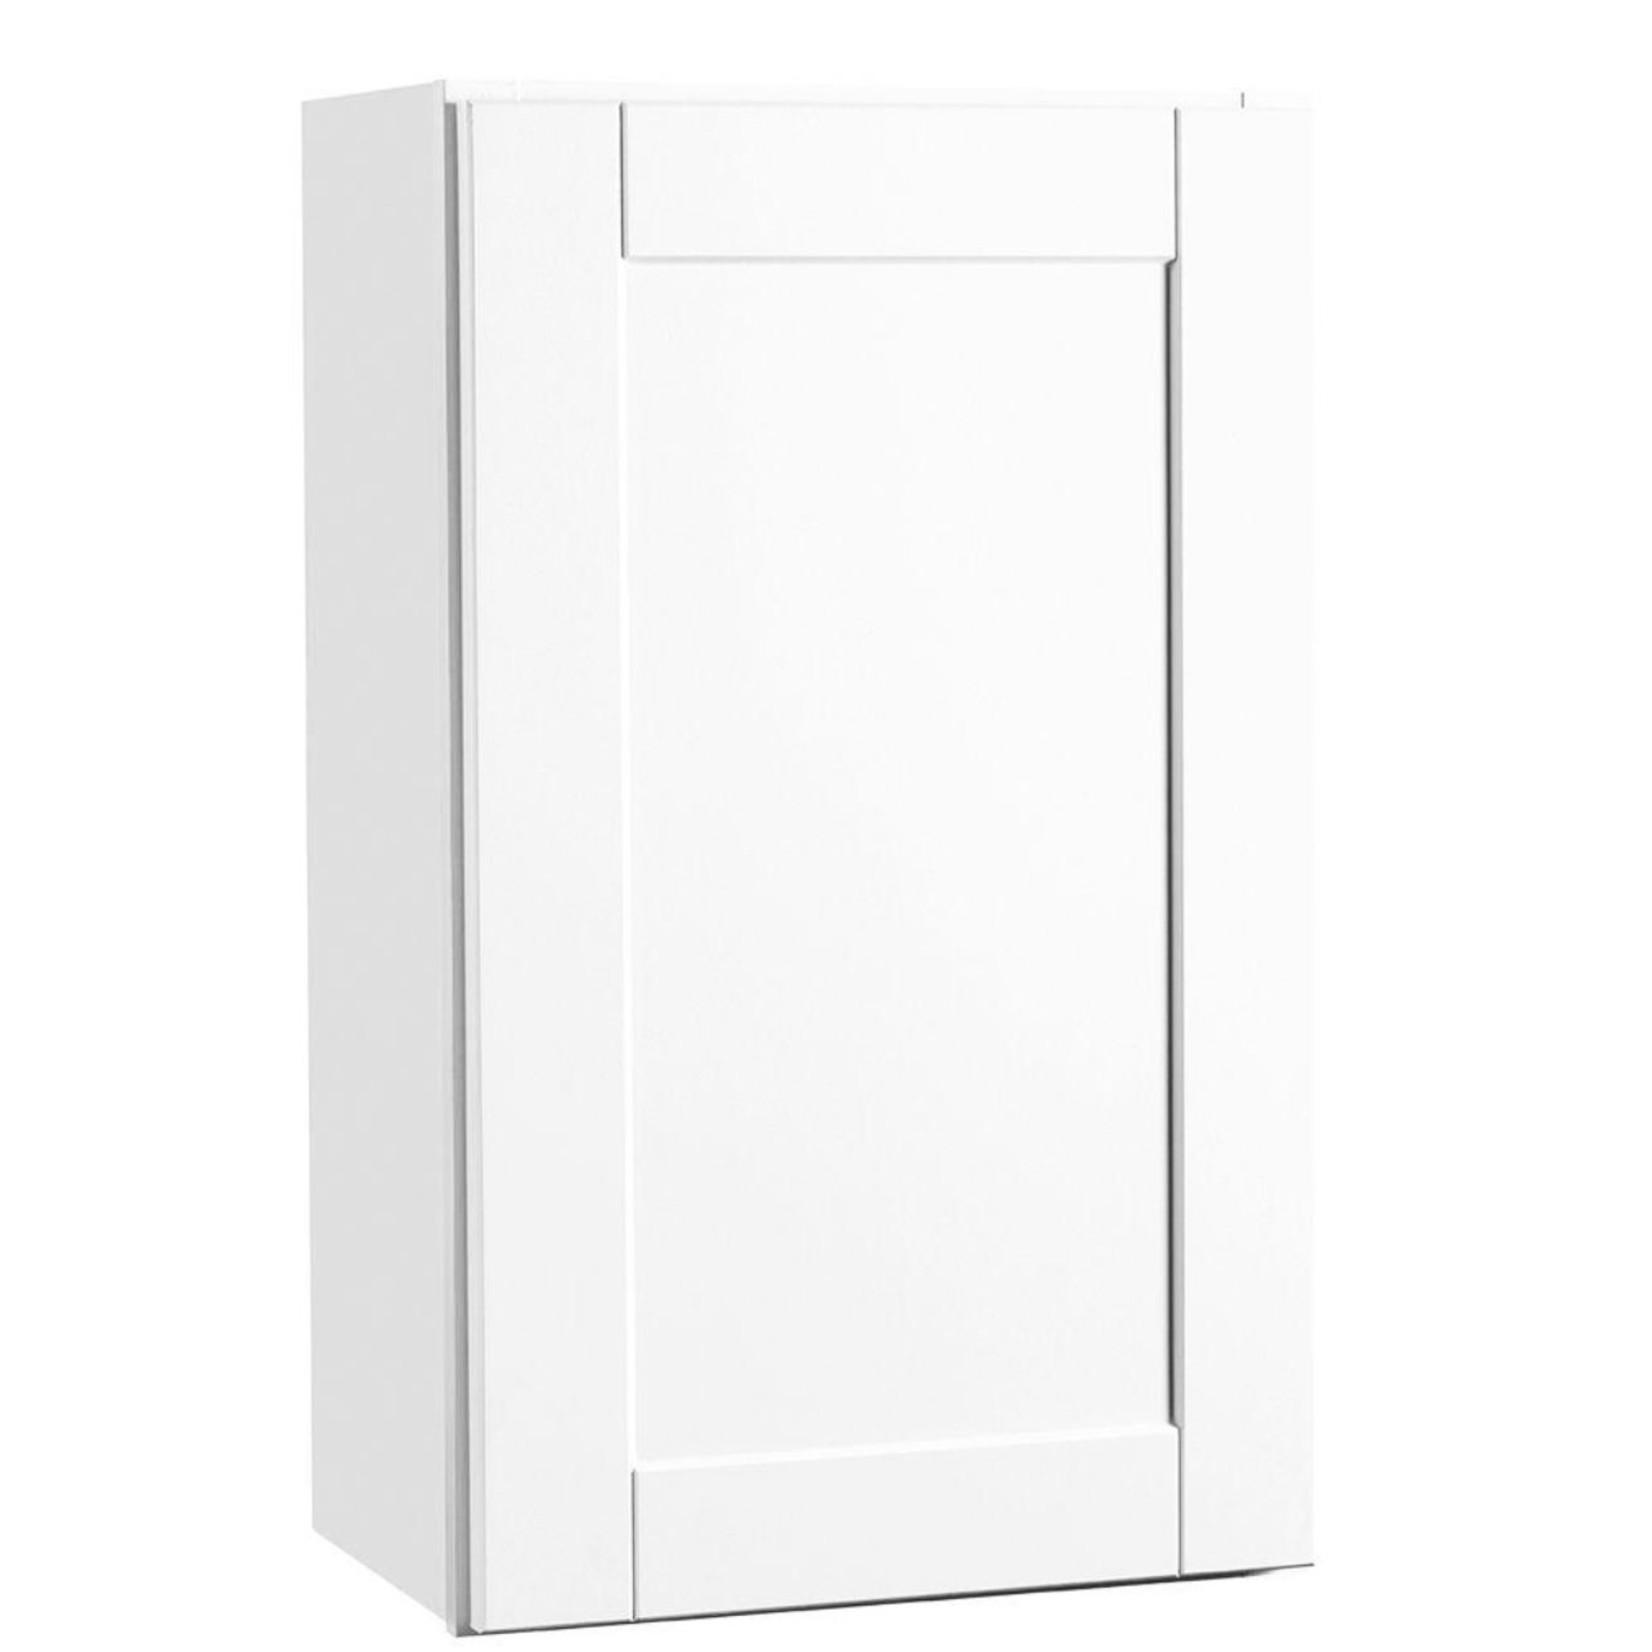 10204 Hampton Bay Shaker Style Wall Cabinet